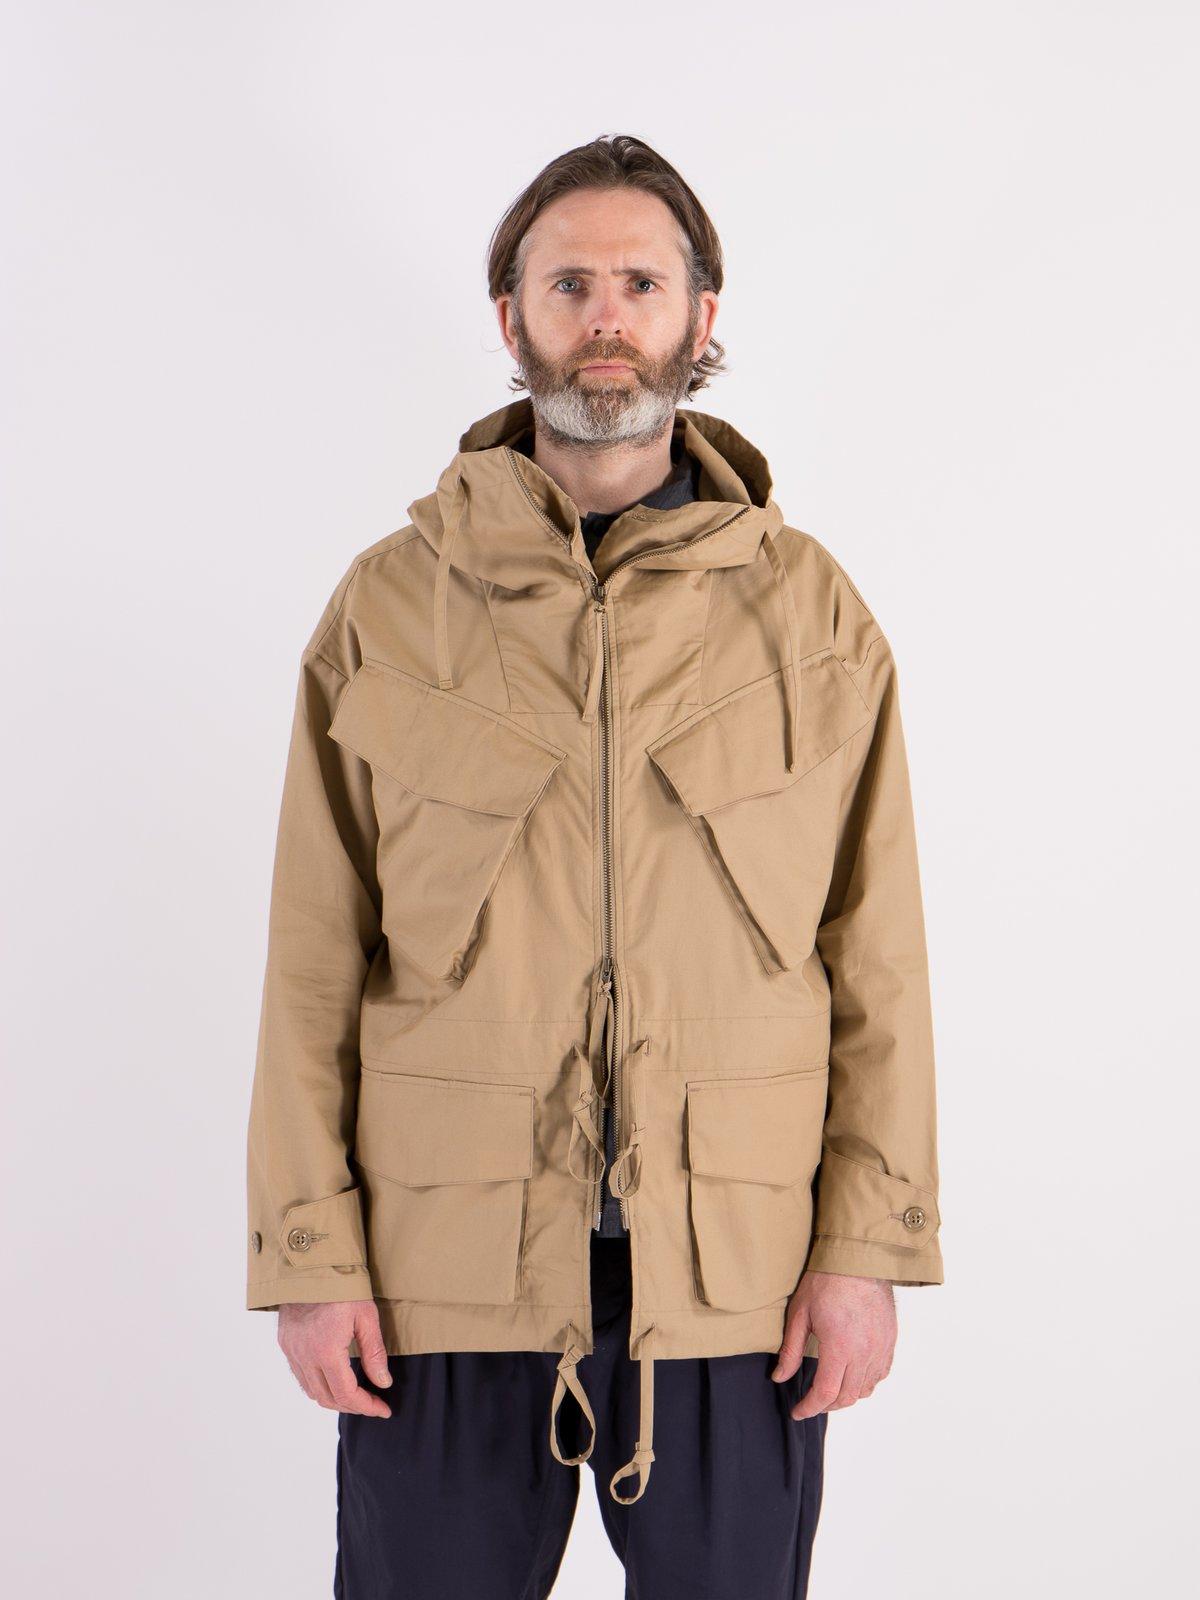 Khaki Oxford Vancloth Expedition Half Coat - Image 2